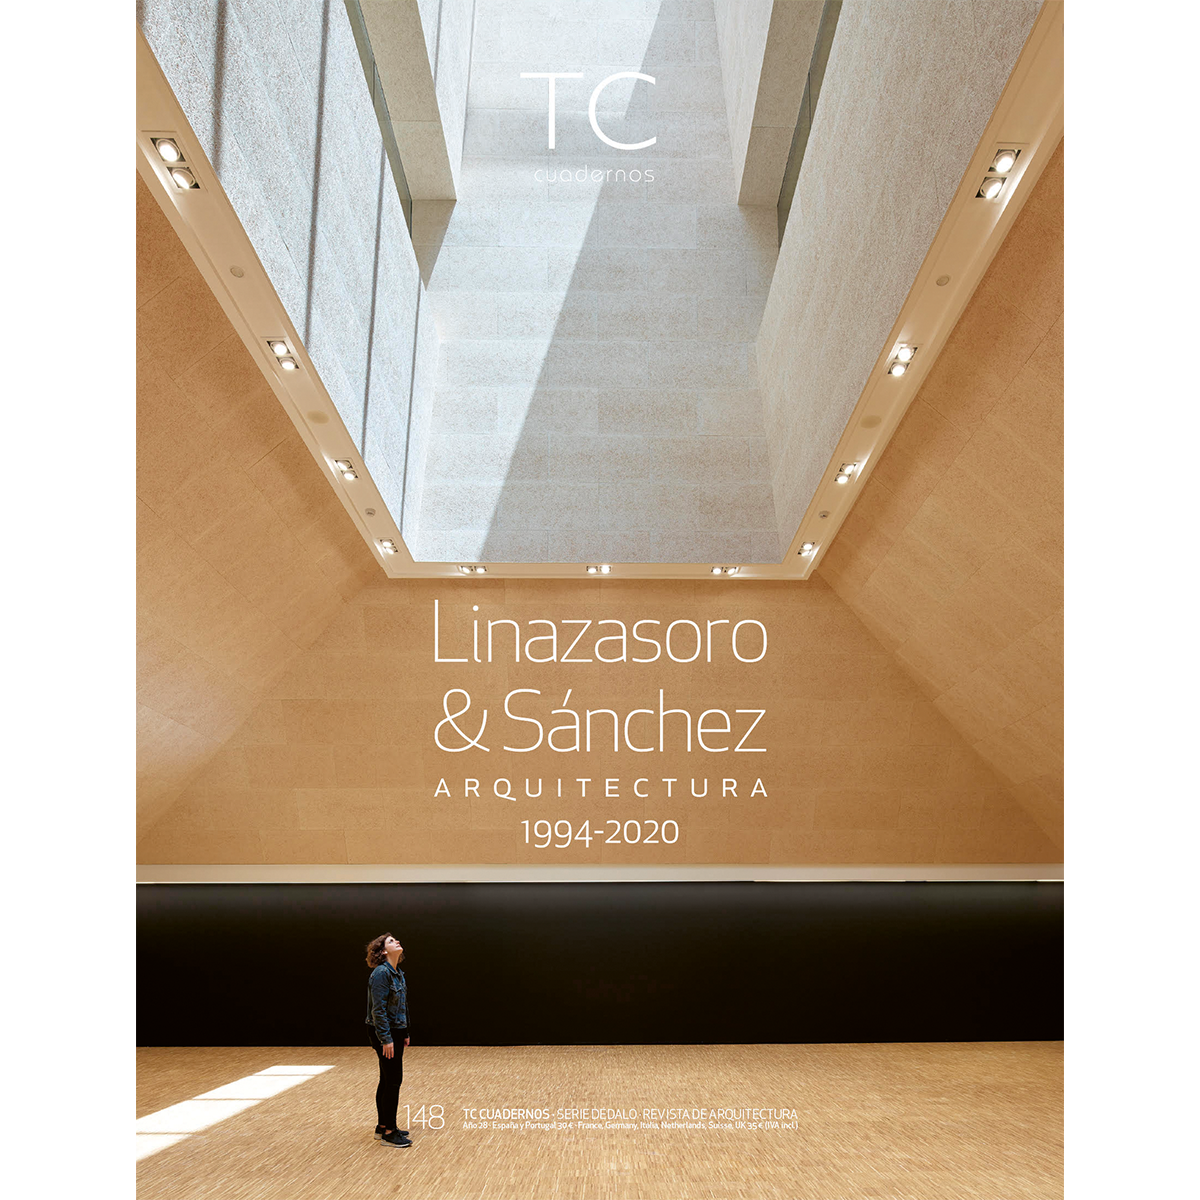 TC Cuadernos: Linazasoro & Sánchez